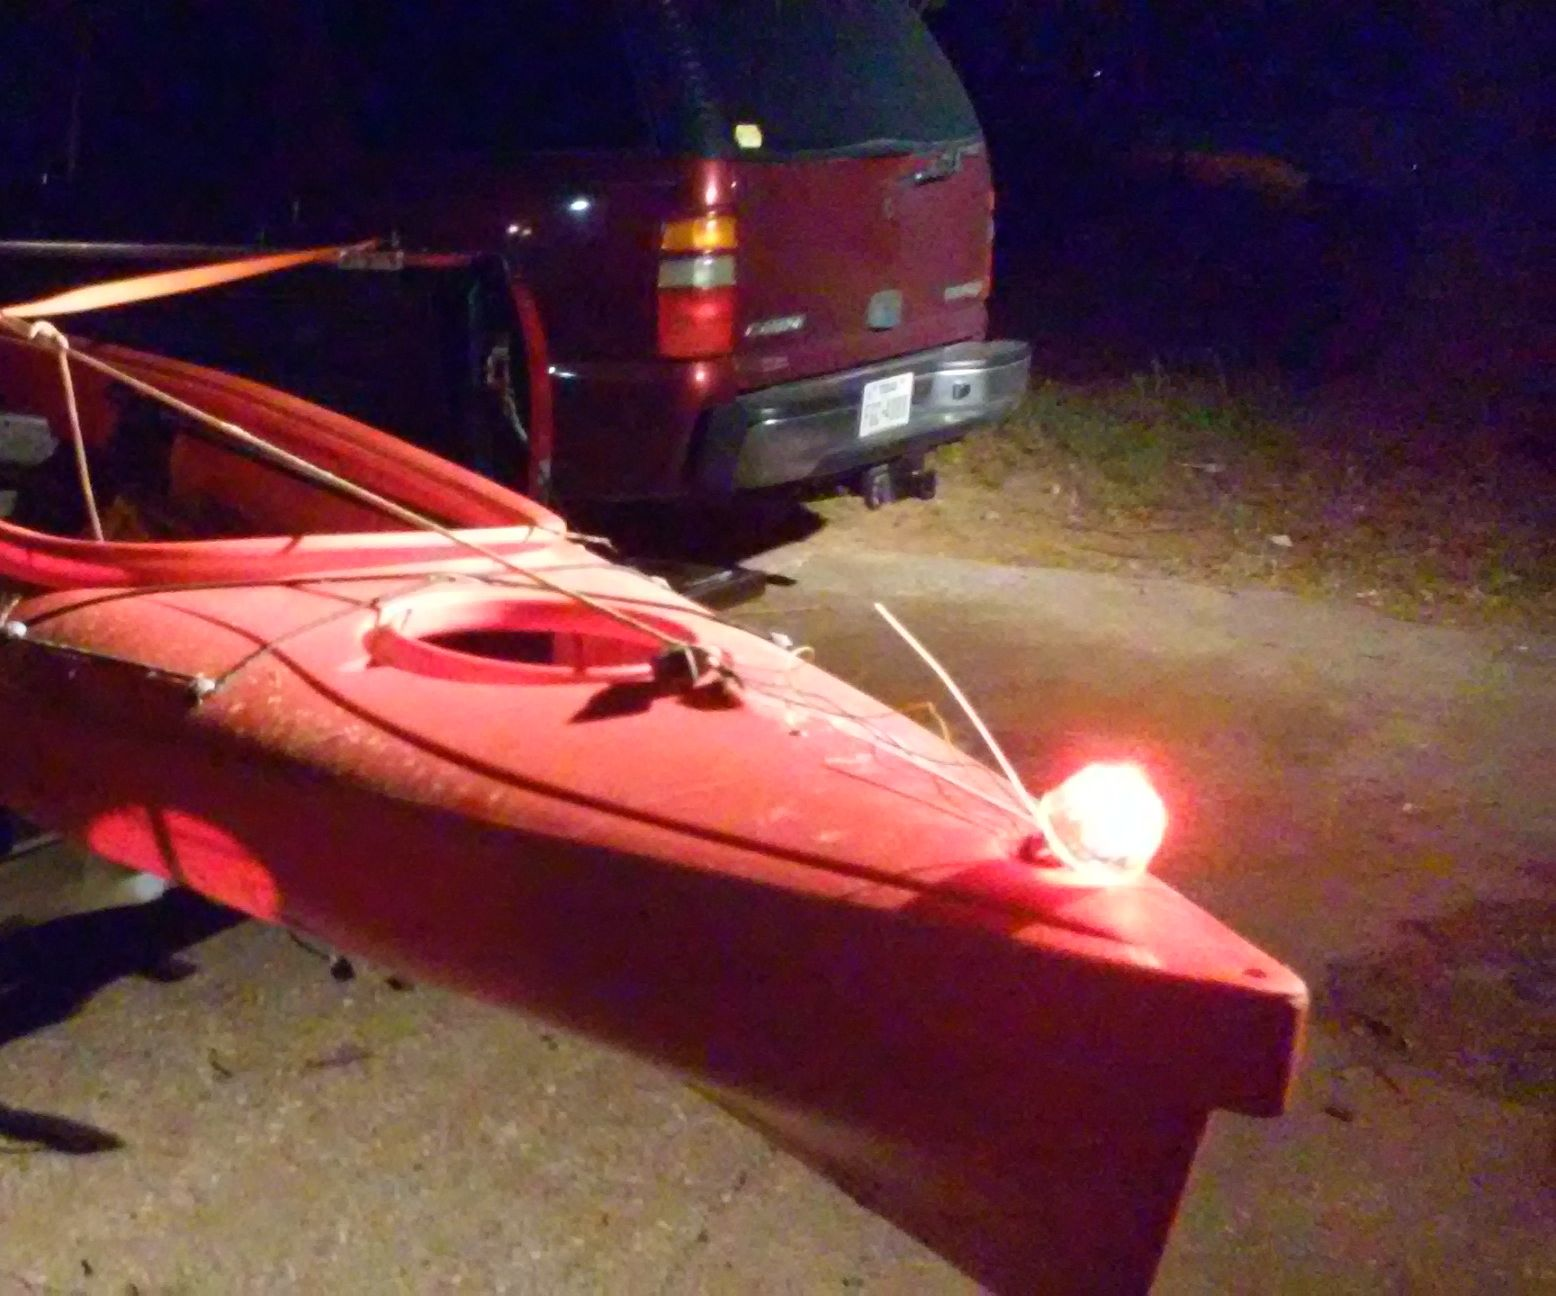 Kayak LED Light: 8 Steps on